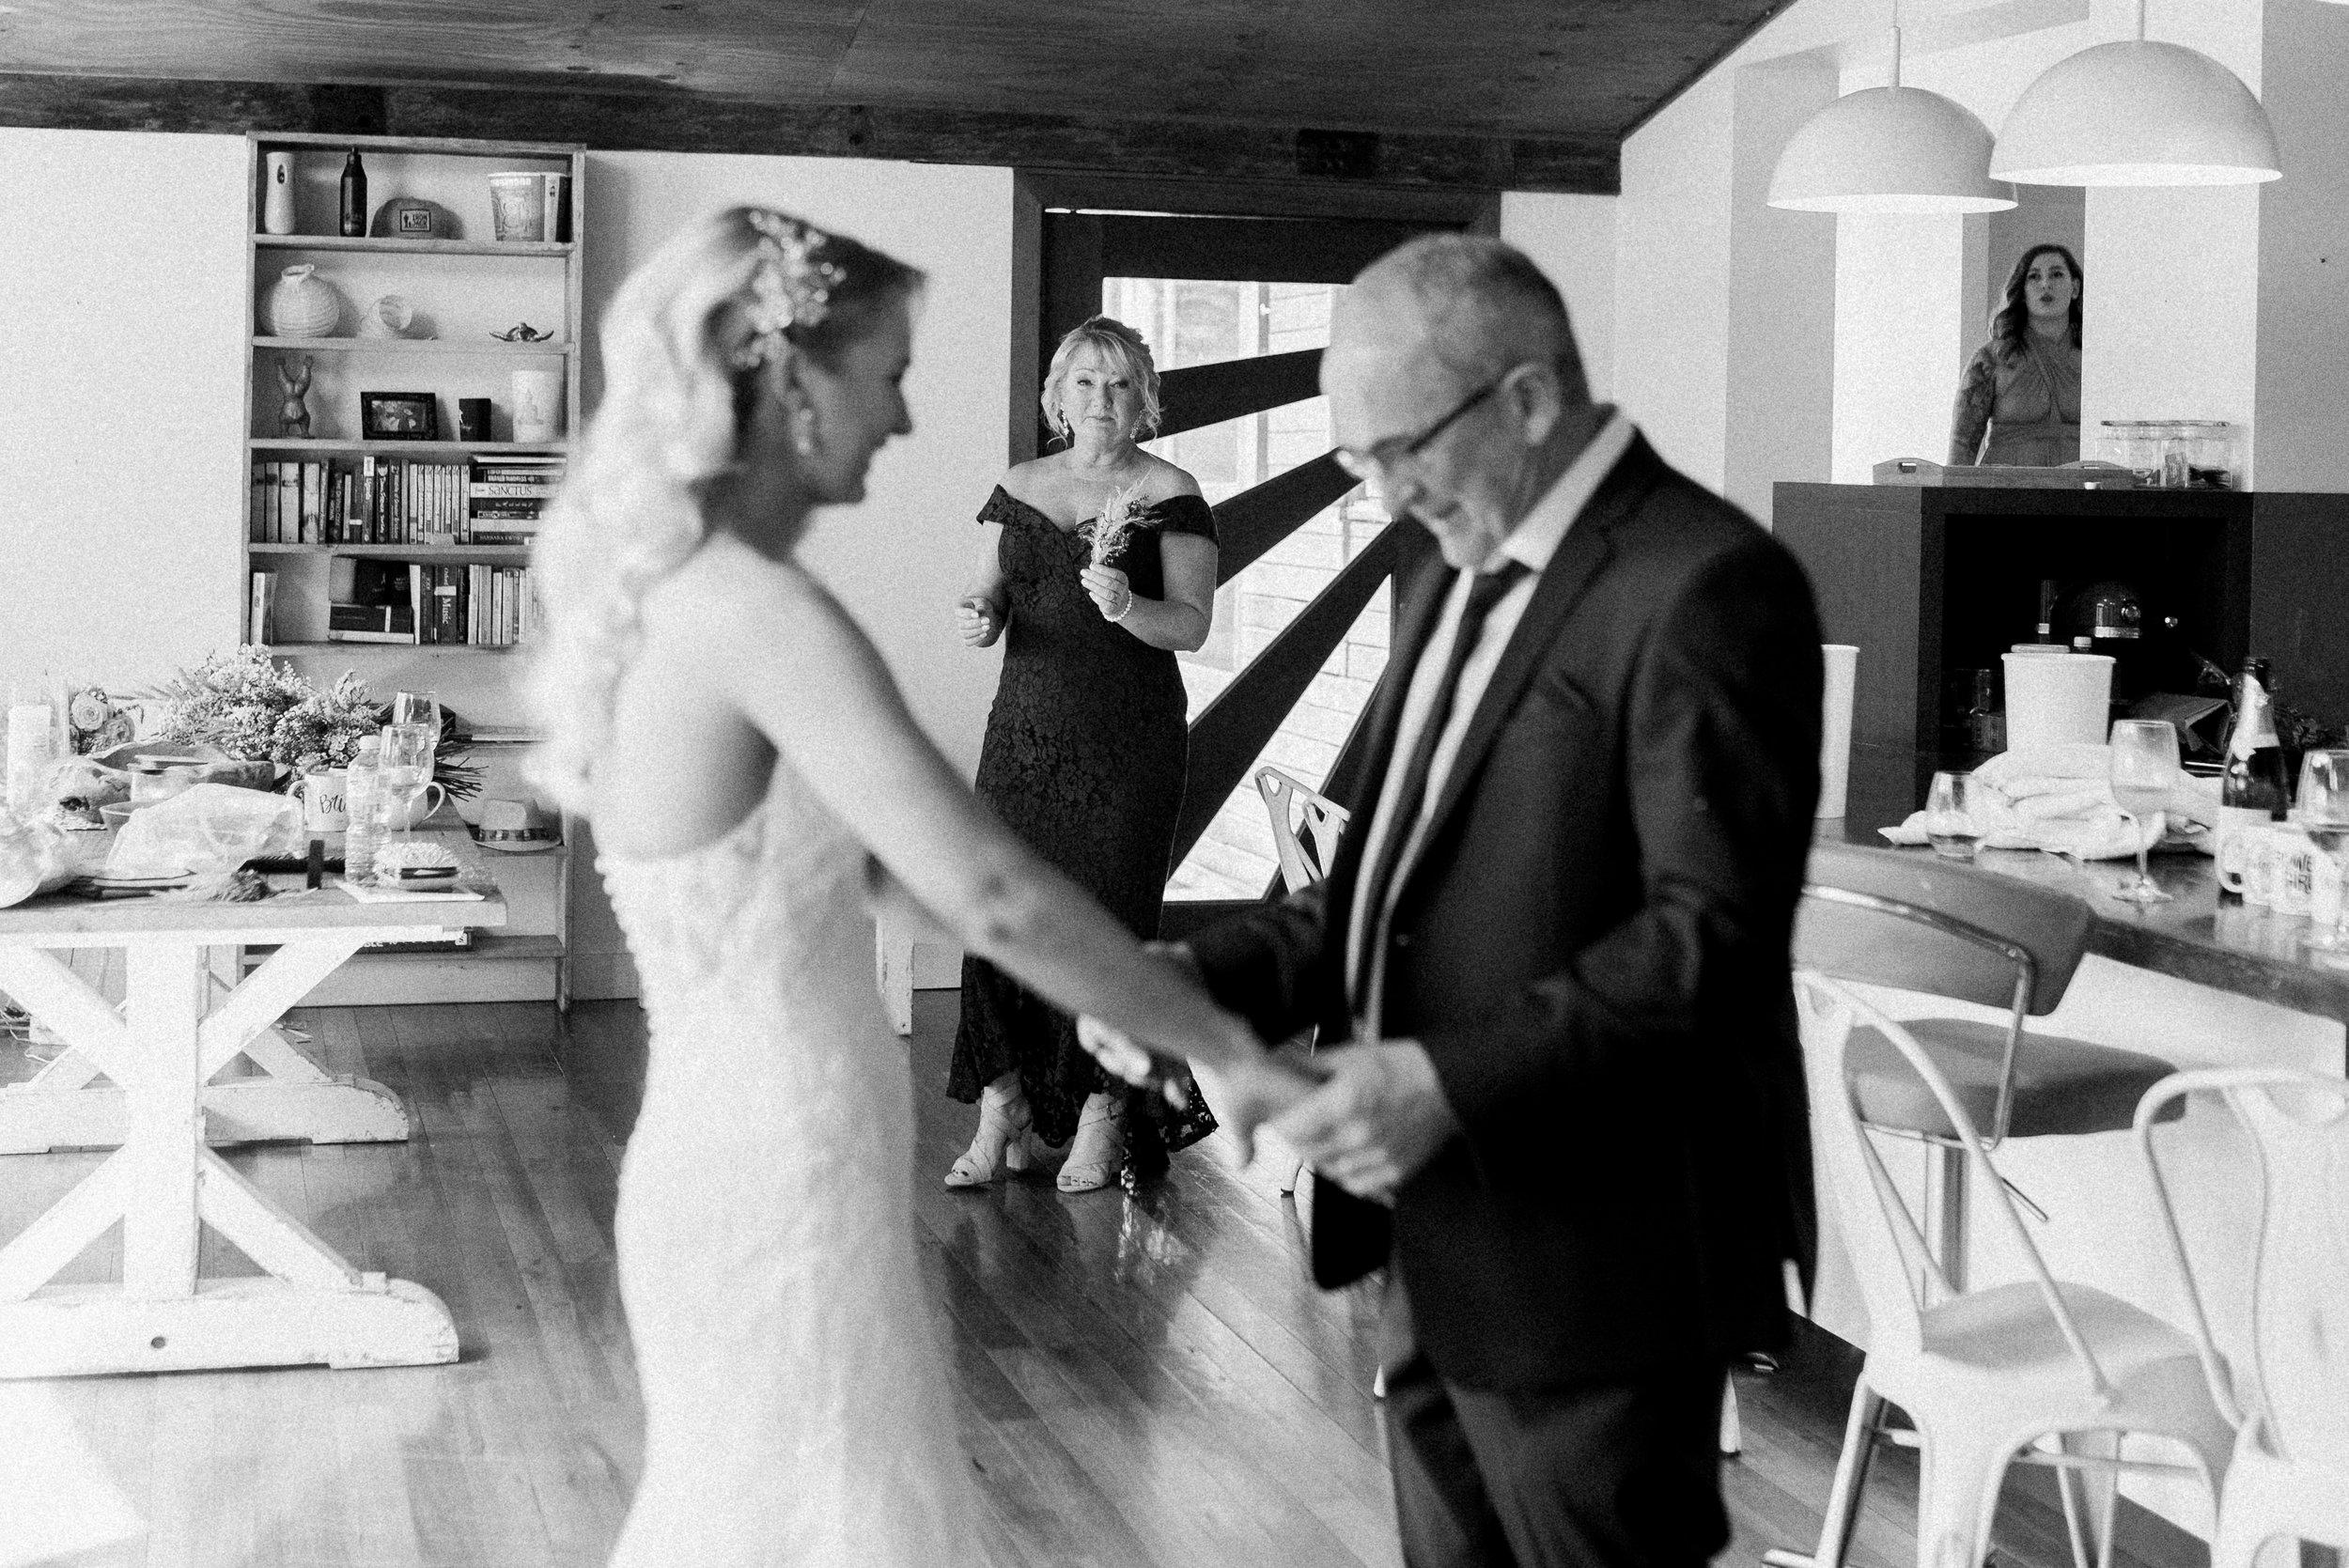 Kooroomba-Vineyard-Lavender-Farm-Wedding-Fine-Art-Lauren-Olivia-14.jpg